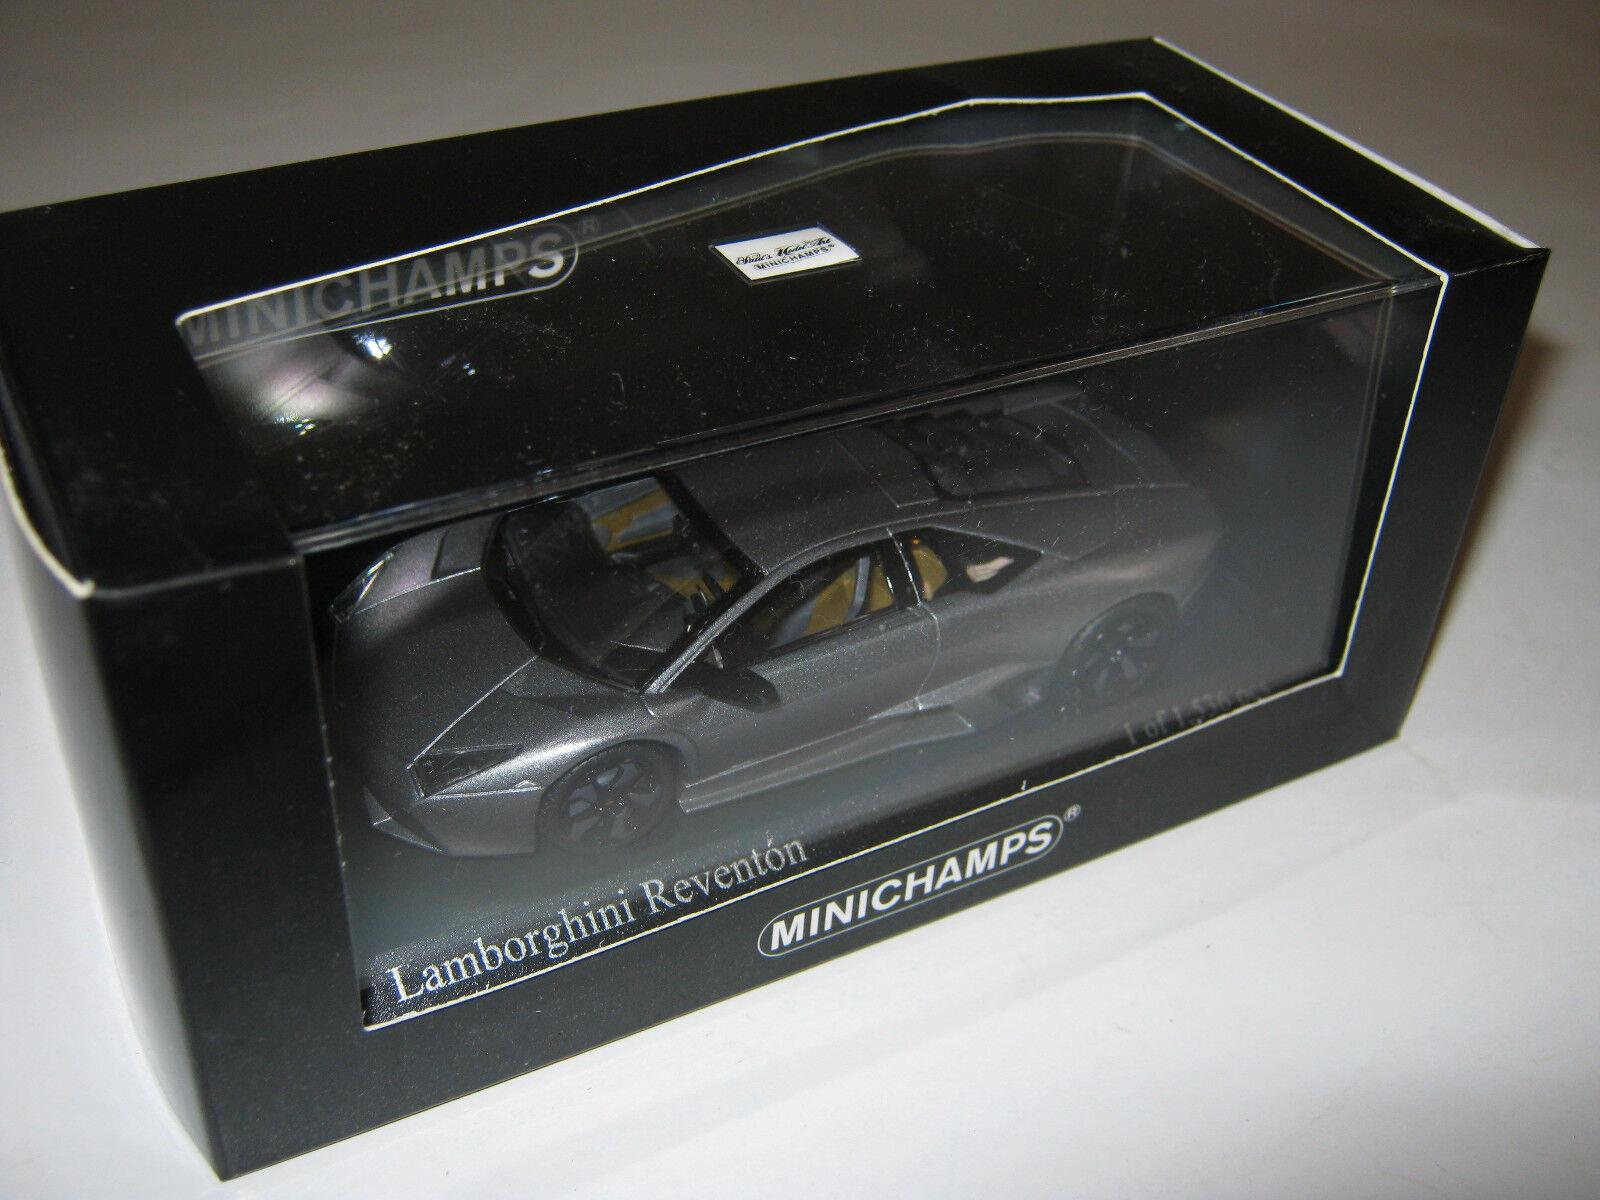 1 43 Lamborghini Reventon Reventon Reventon grey met. 2007 L.E. MINICHAMPS 400103950 OVP new efa7c6